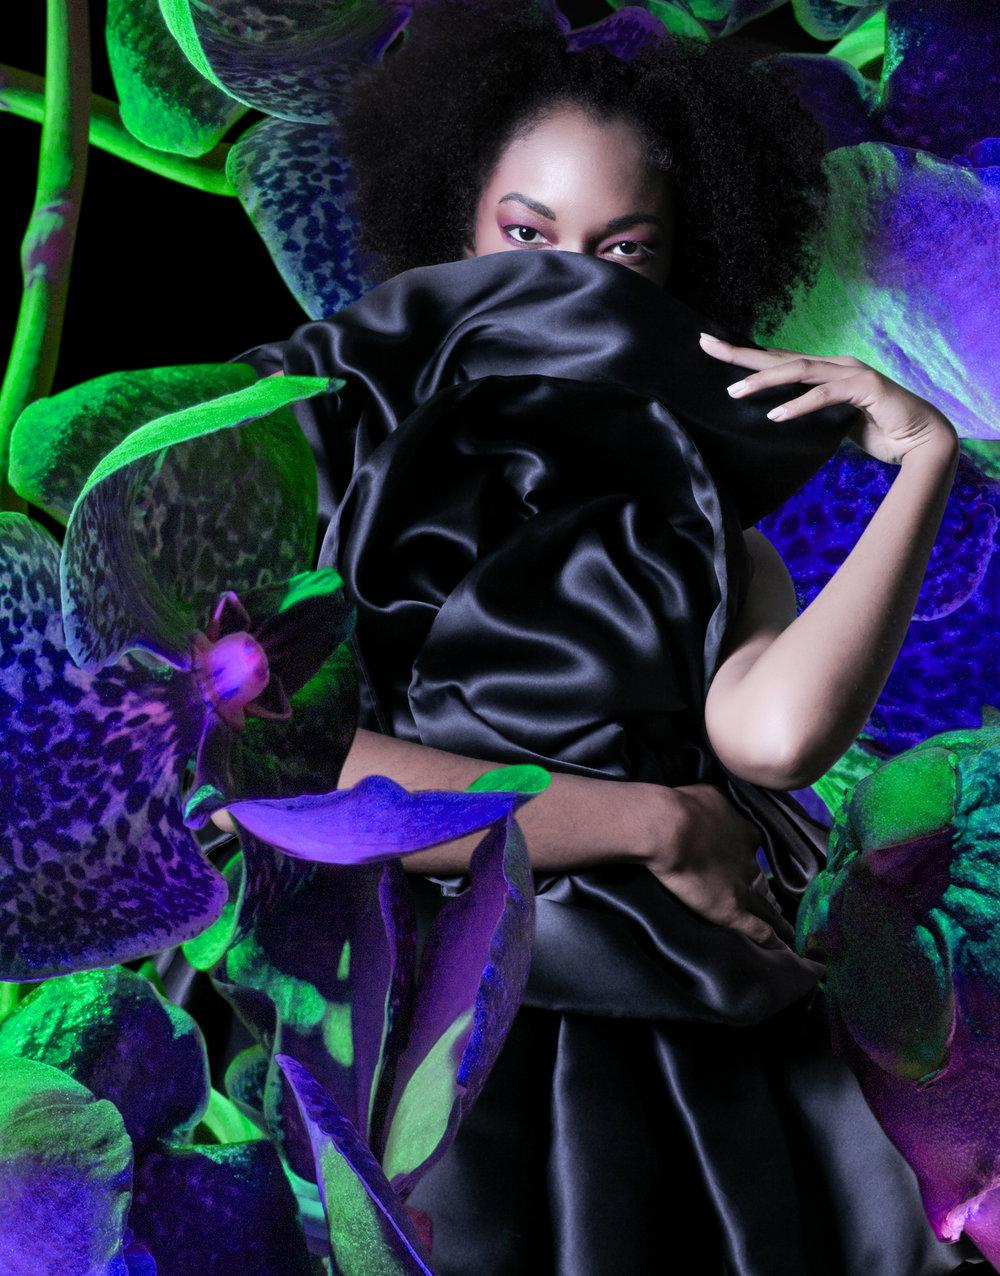 Photography & Collage: Fabian Leon Villa / EssentialsCreative.com Fashion Design: Jordan Butler @simulacrapbag Model: Ebanie Griffith @beaniebbby